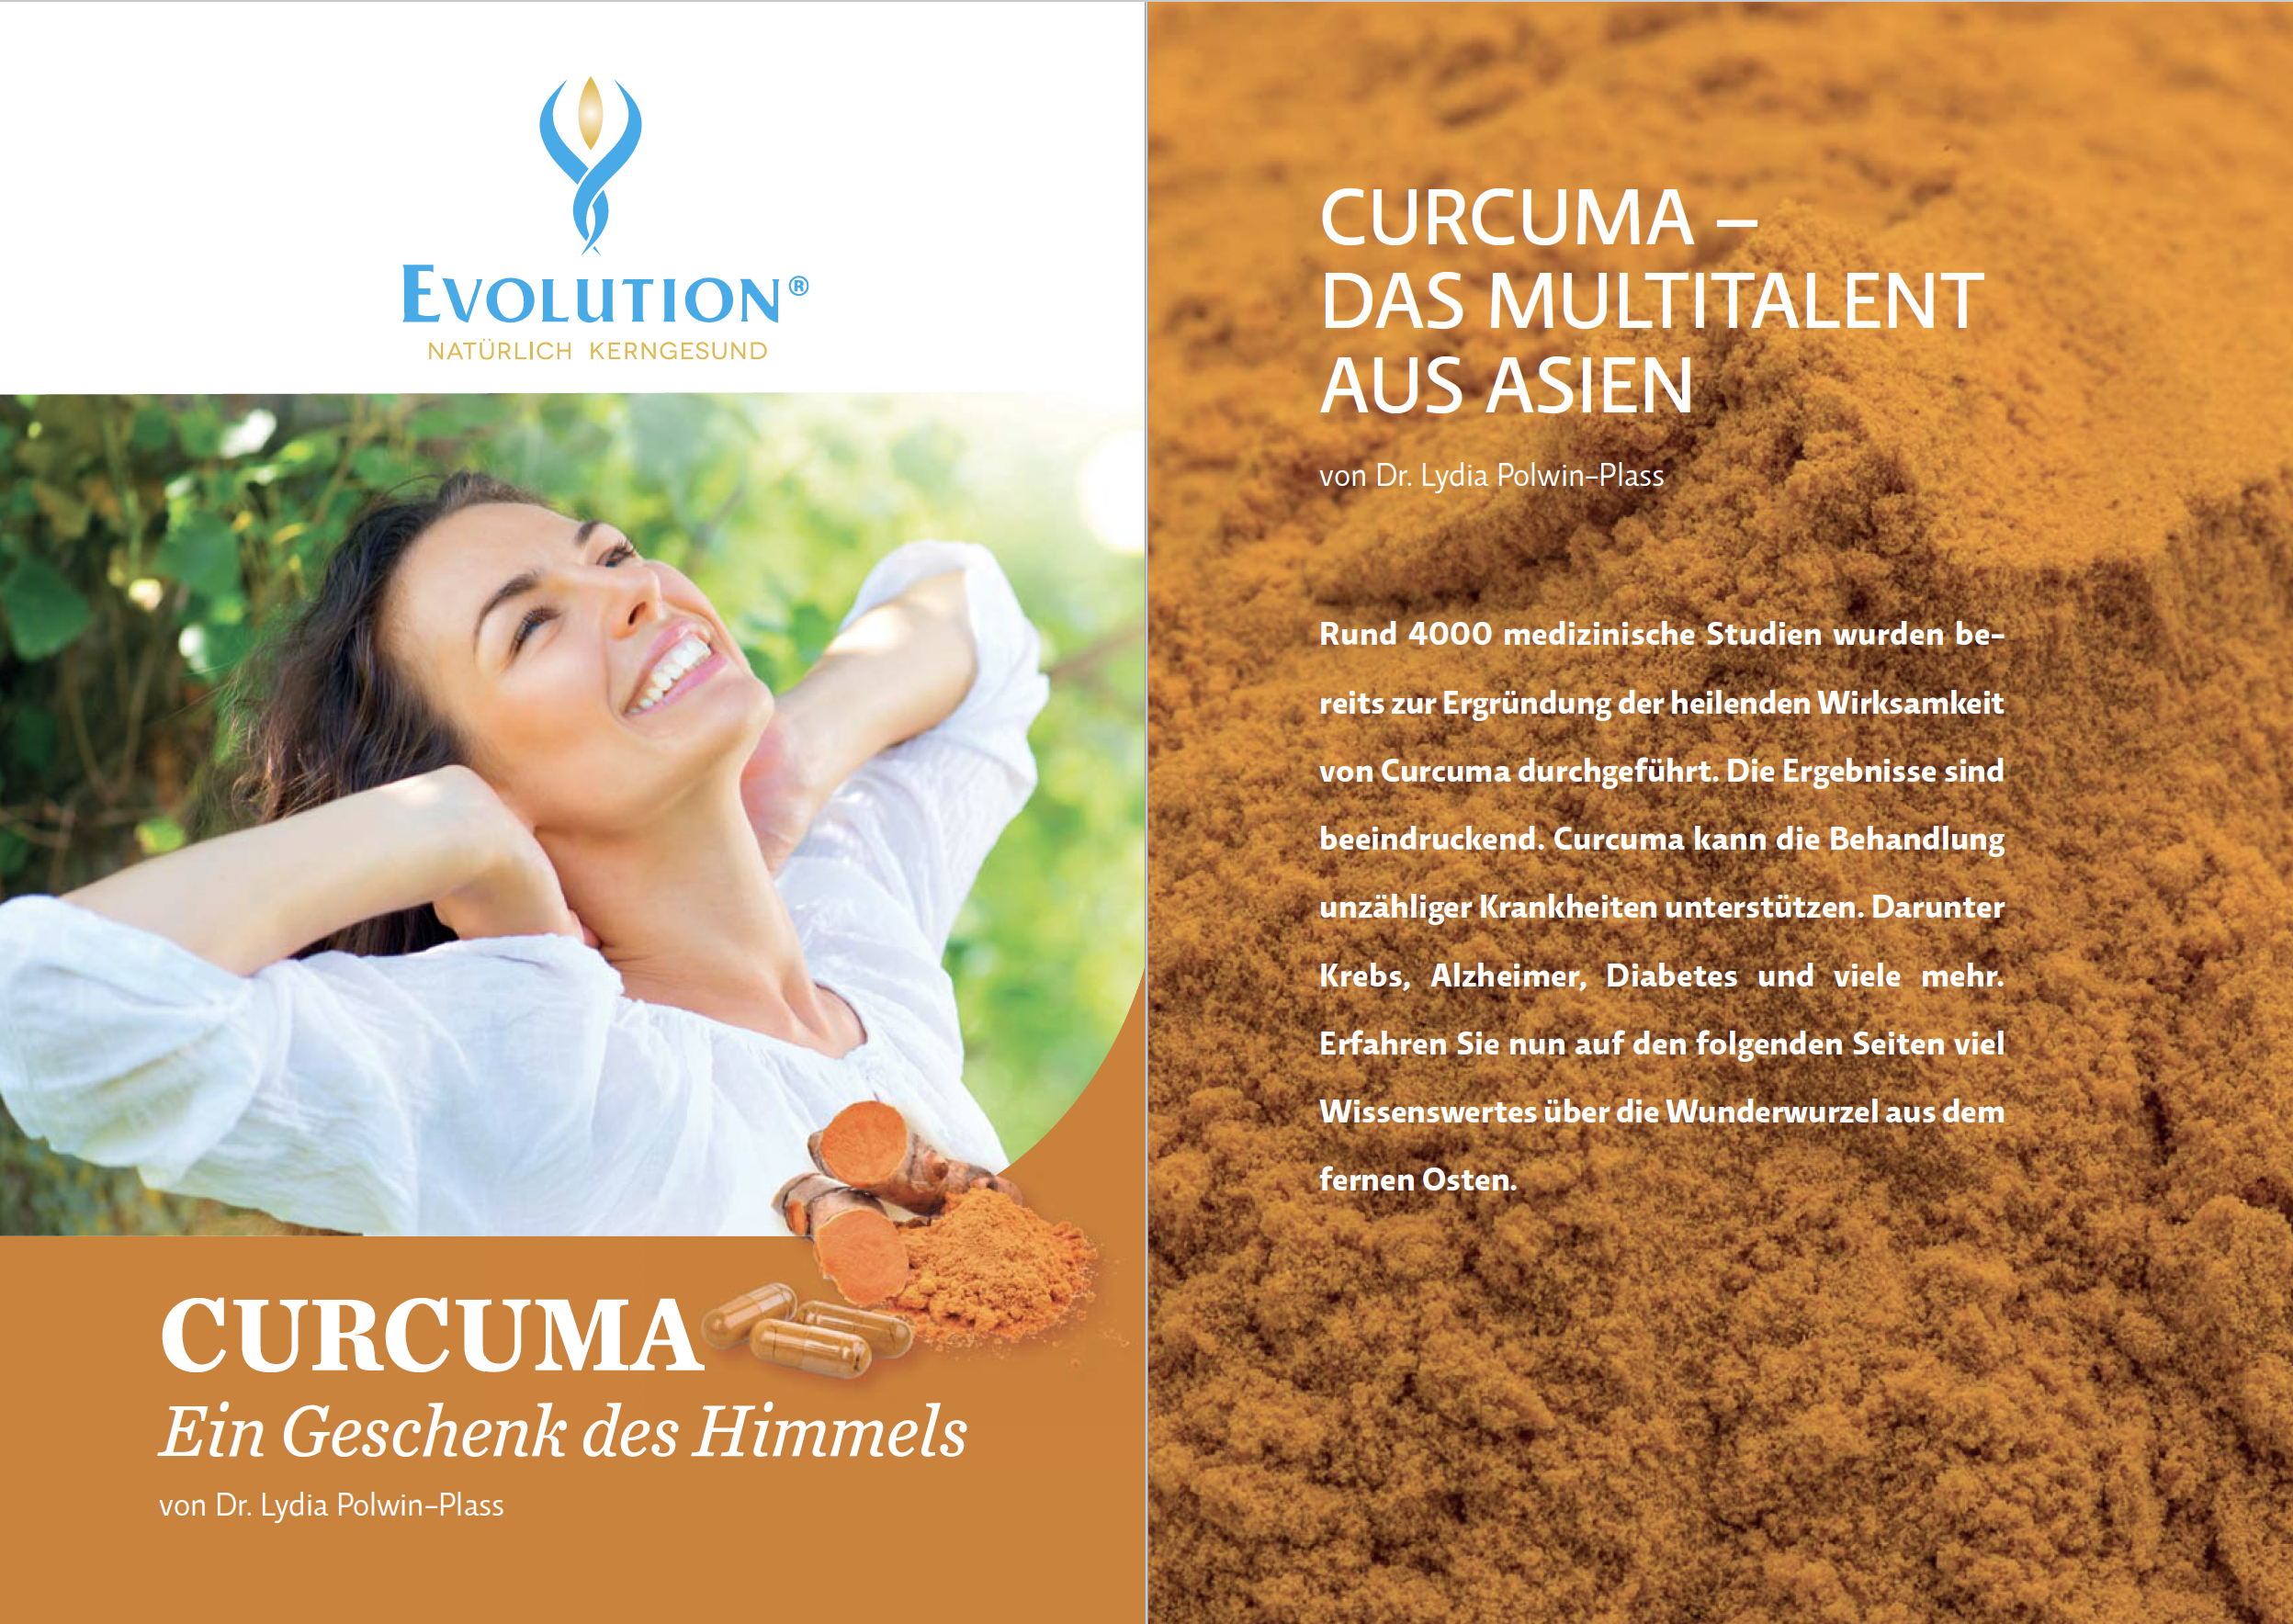 Curcuma Broschuere Dr. Lydia Polwin-Plass